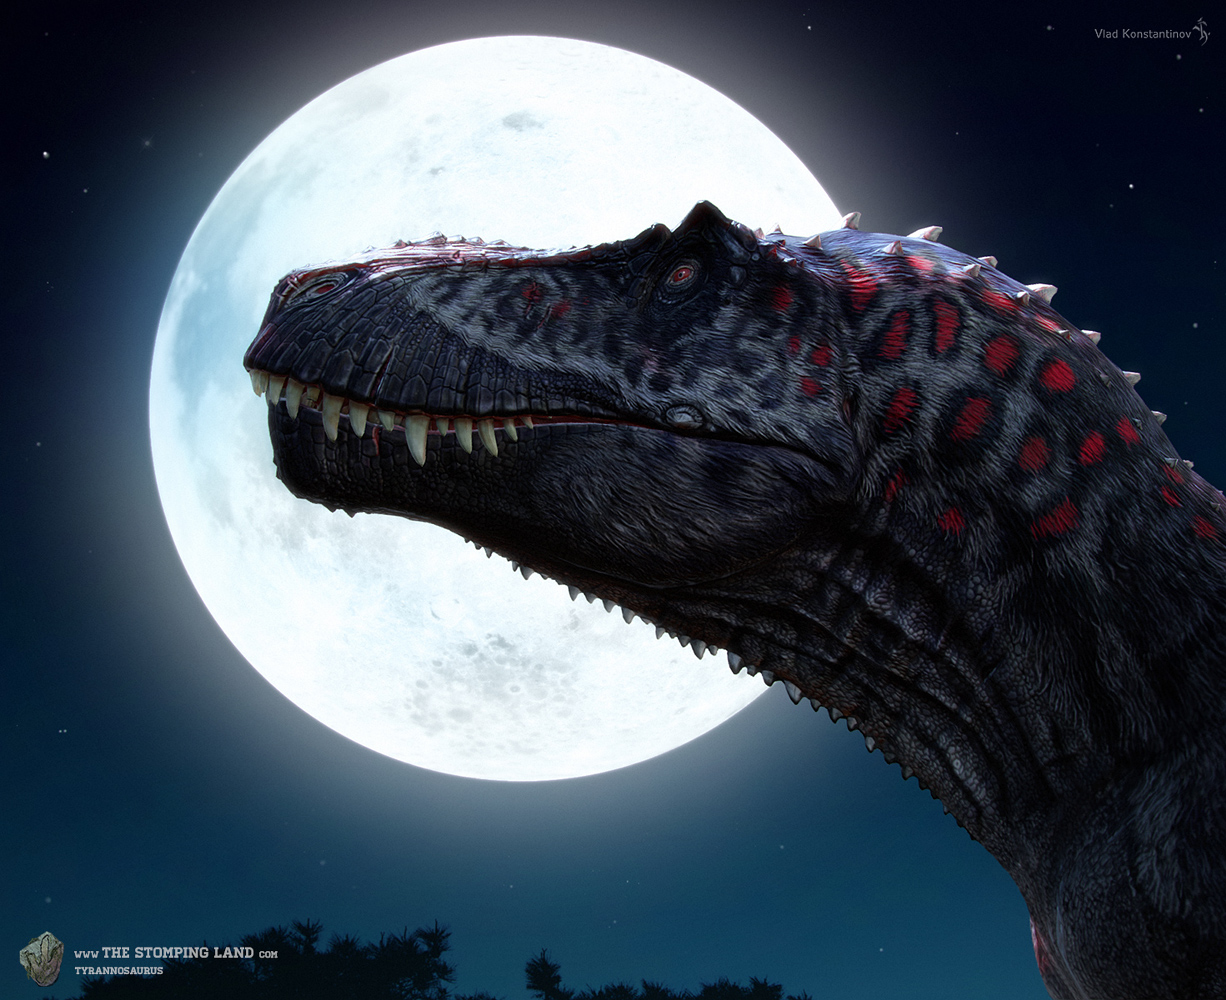 Dynamosaurus Imperiosus/ Raptorexxx 700 Profile